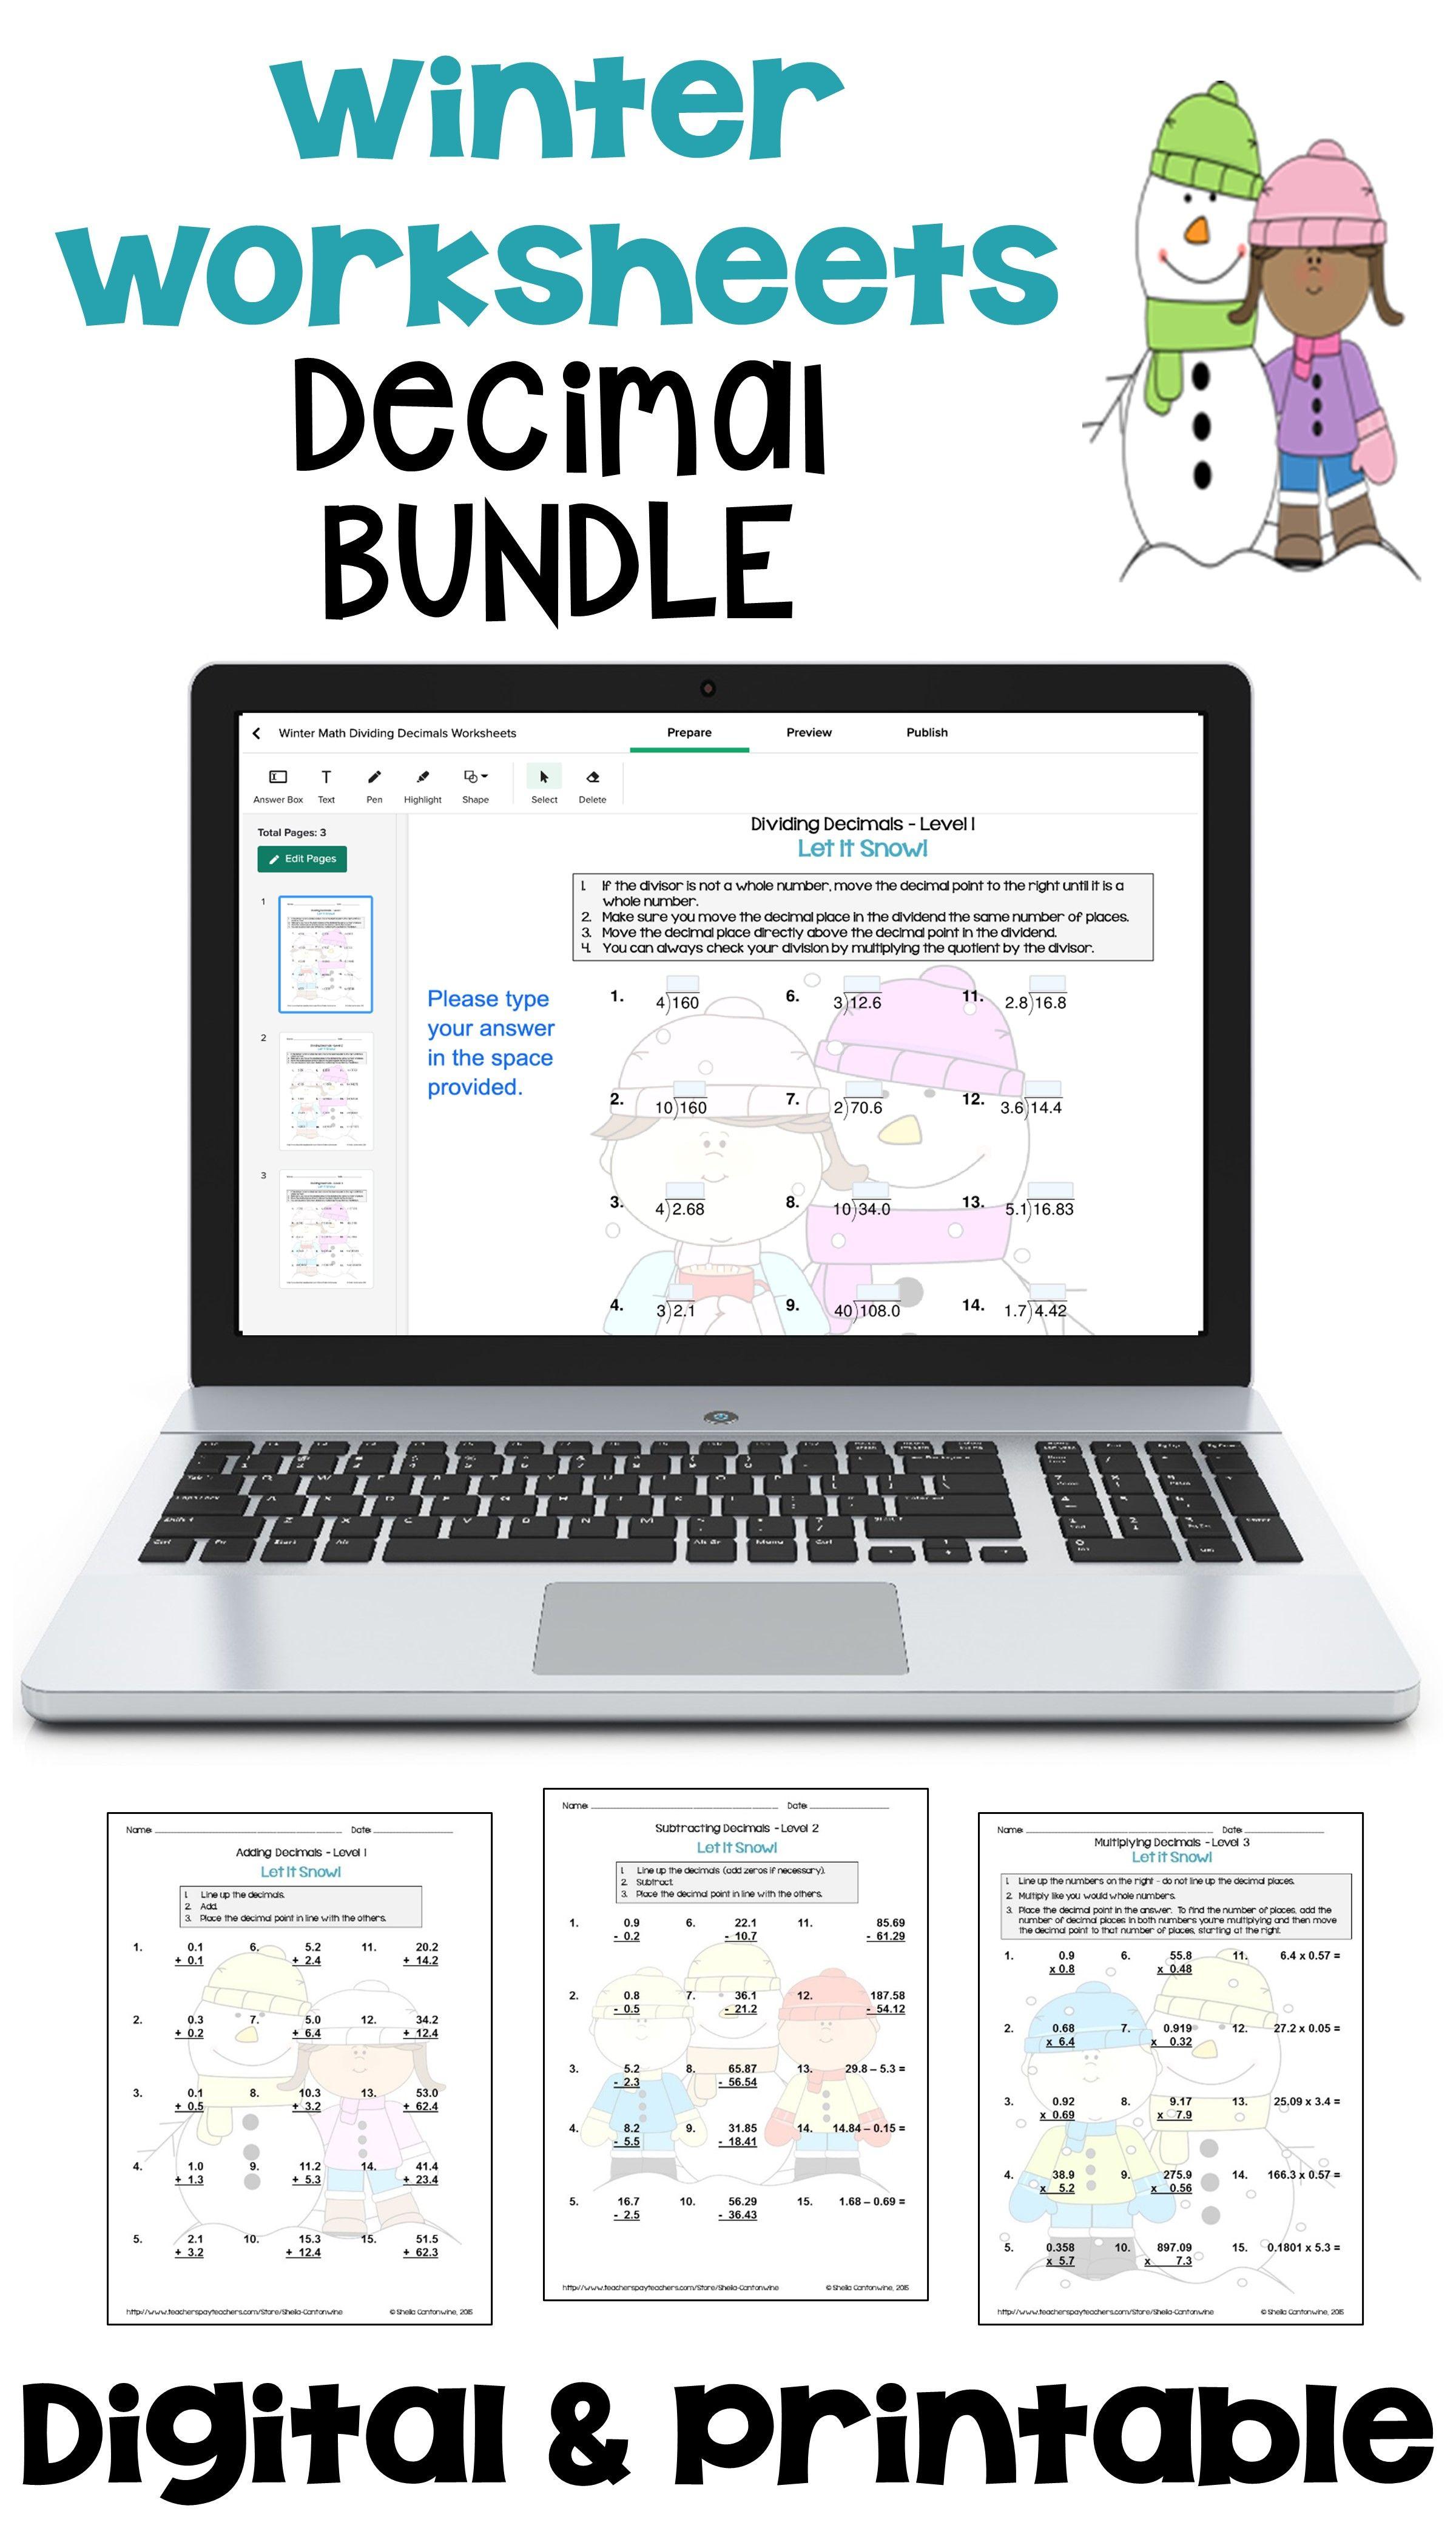 Winter Math Decimal Worksheet Bundle With Printable And Digital Options In 2021 Common Core Math Worksheets Math Math Decimals [ 4200 x 2400 Pixel ]